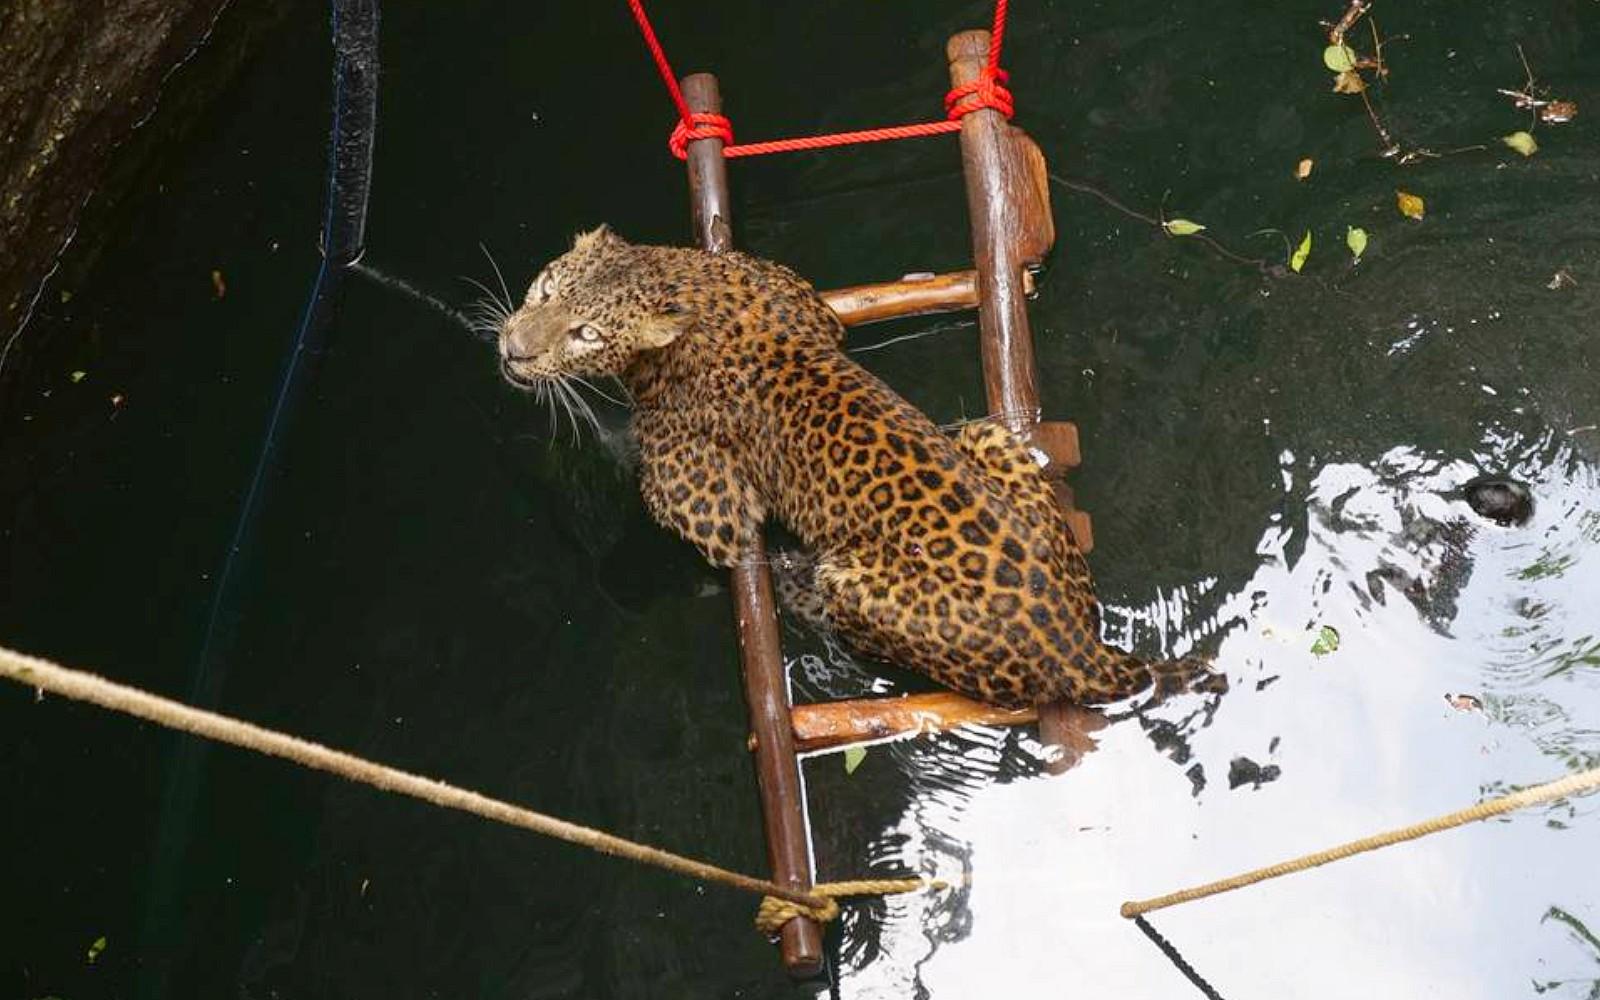 Leopard in well